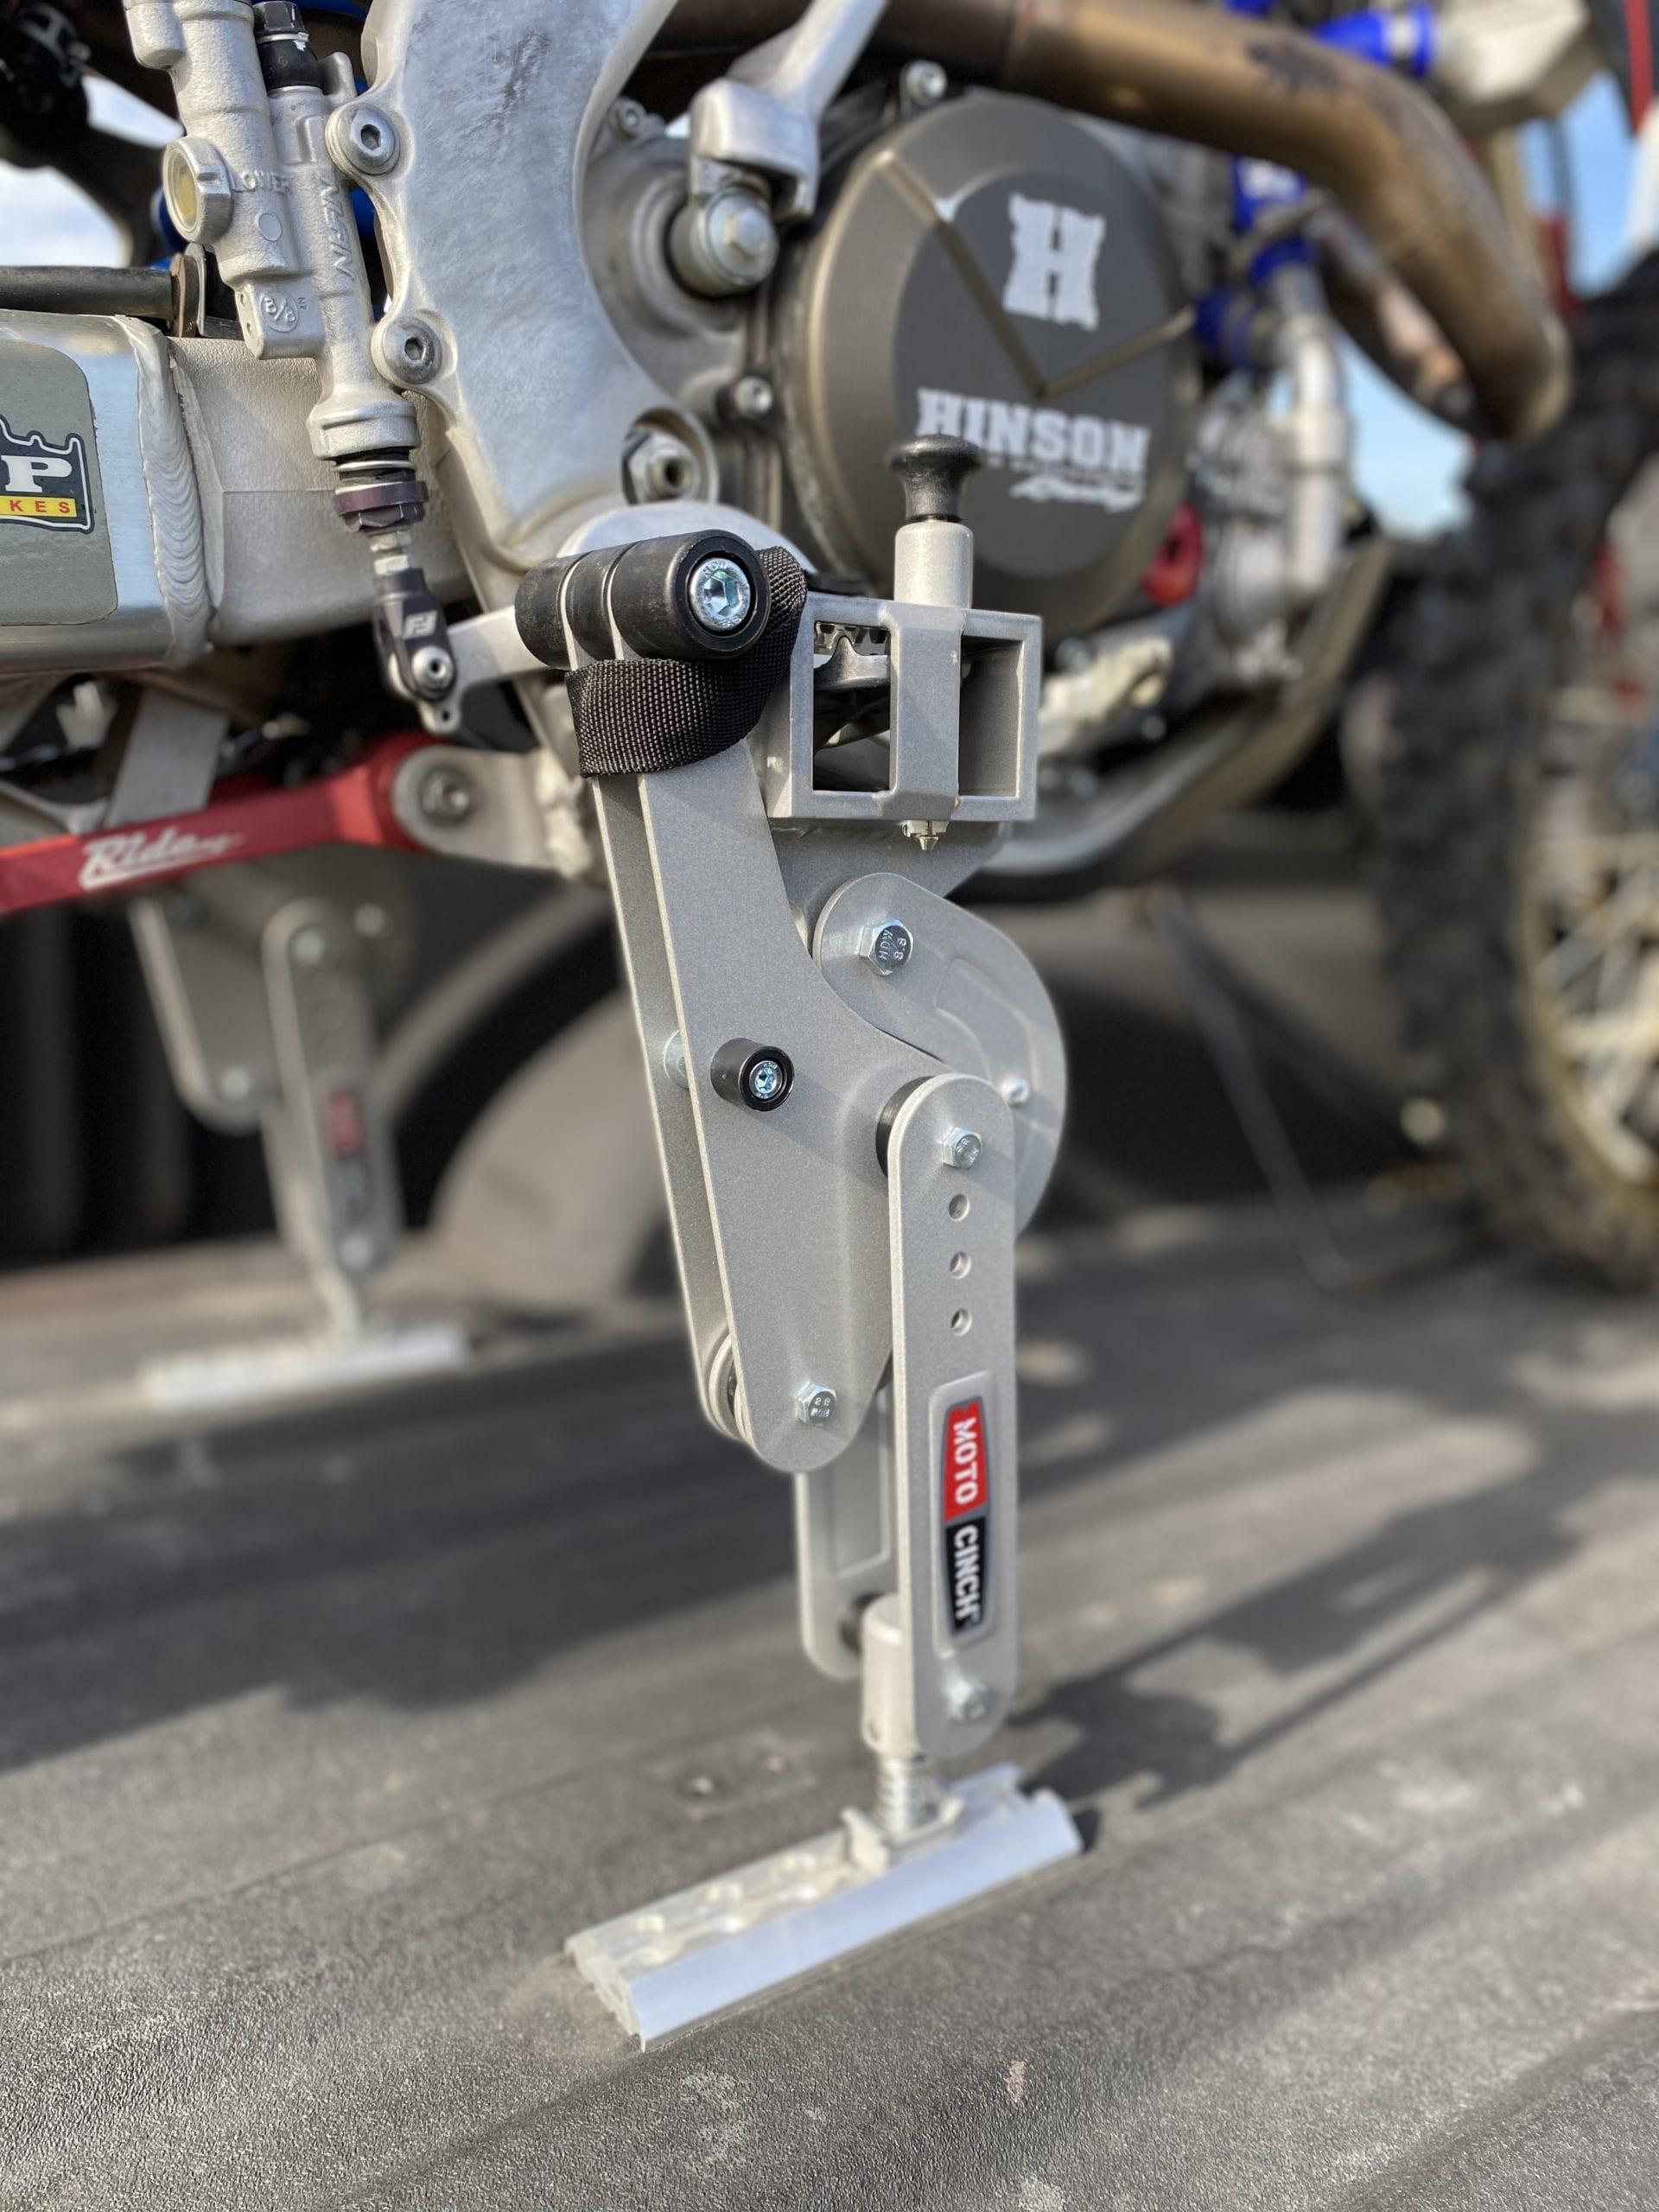 Moto Cinch Mx moto transport system